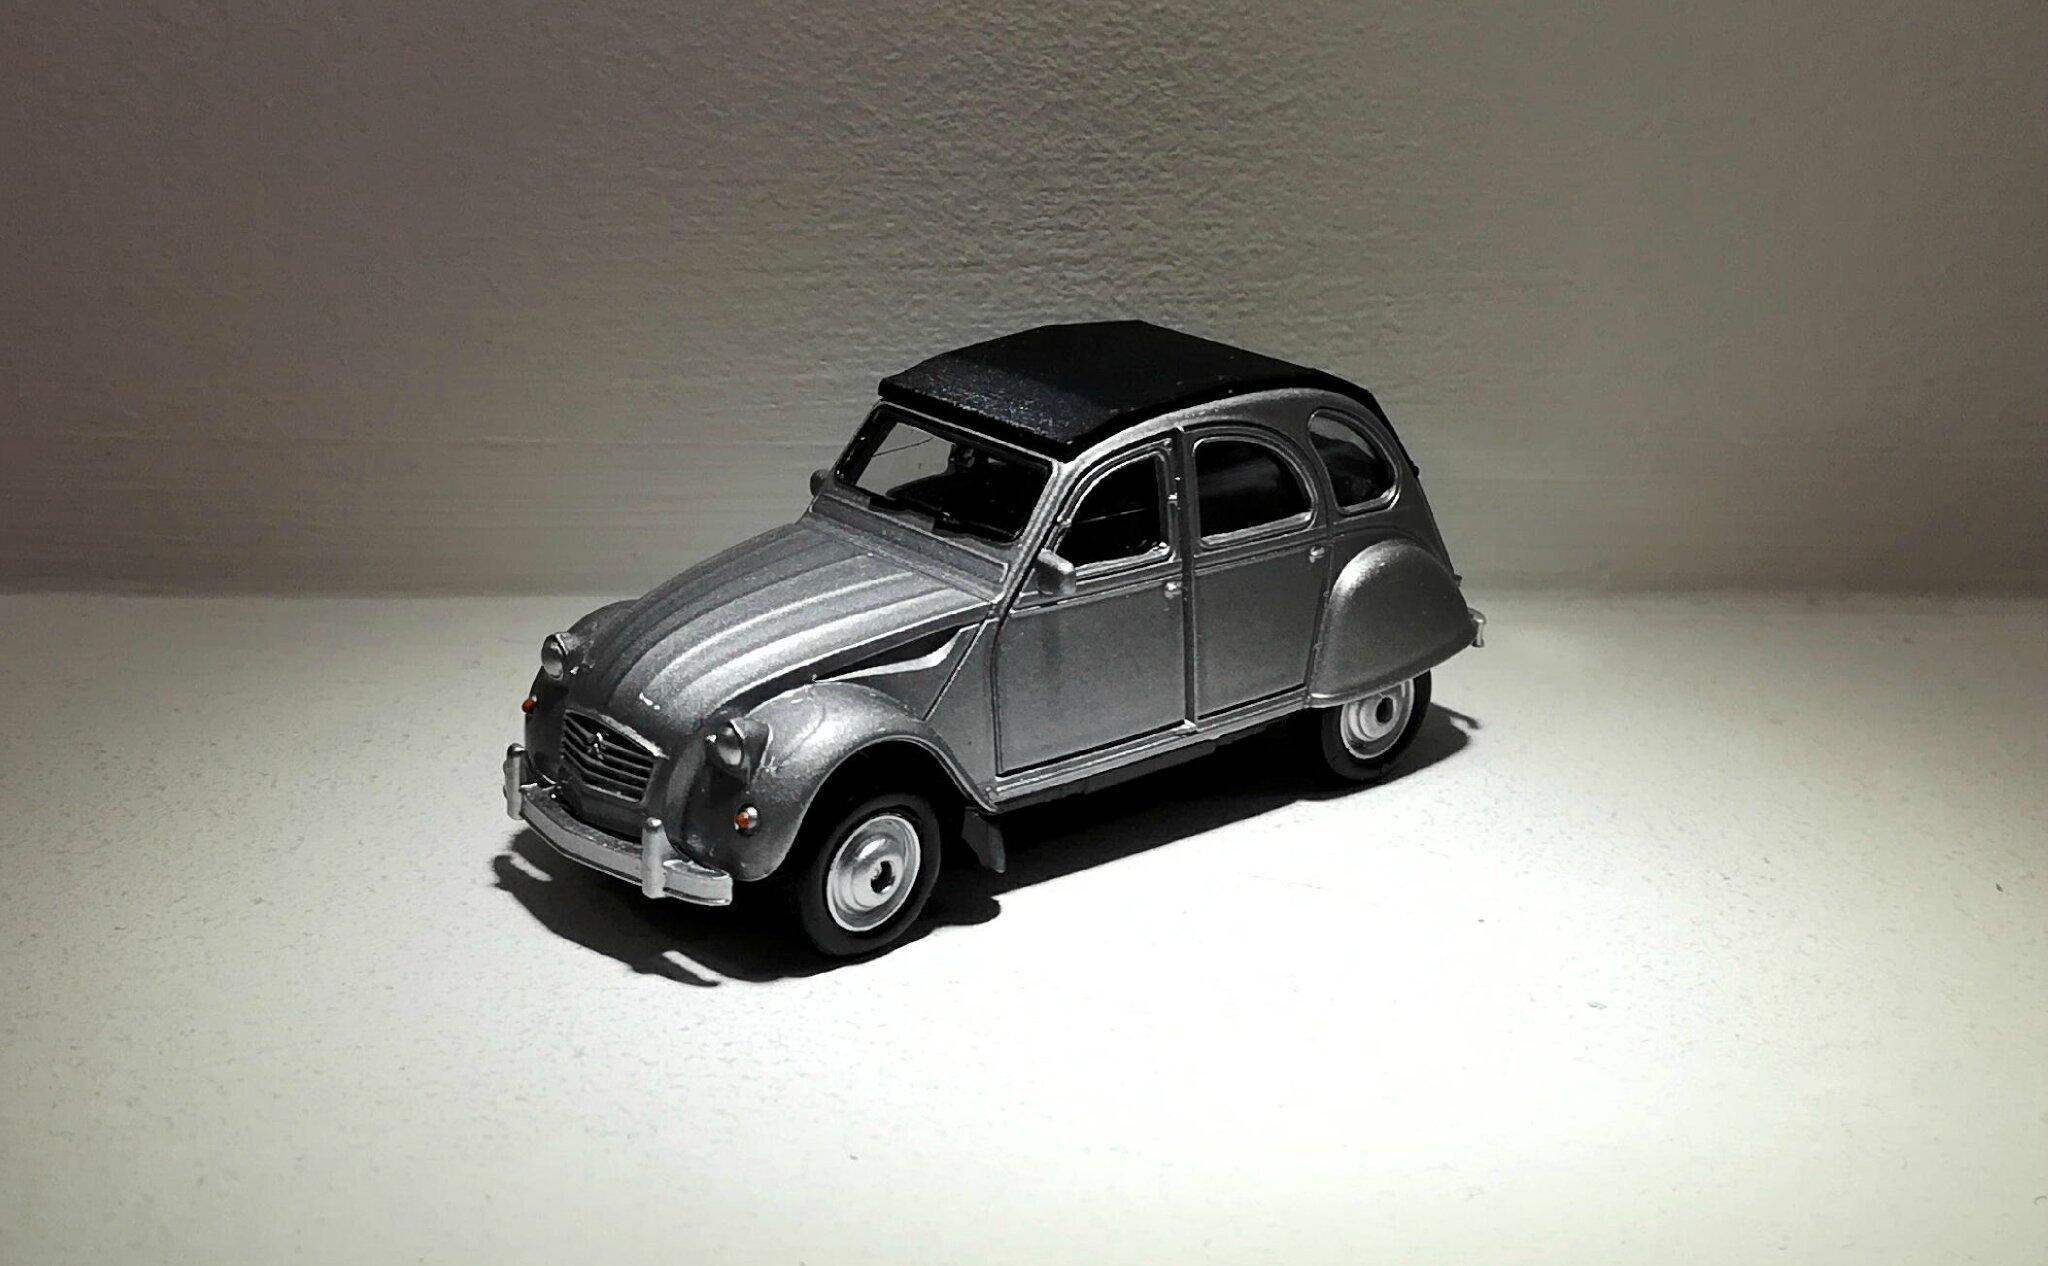 citroen les petites voitures de g g. Black Bedroom Furniture Sets. Home Design Ideas